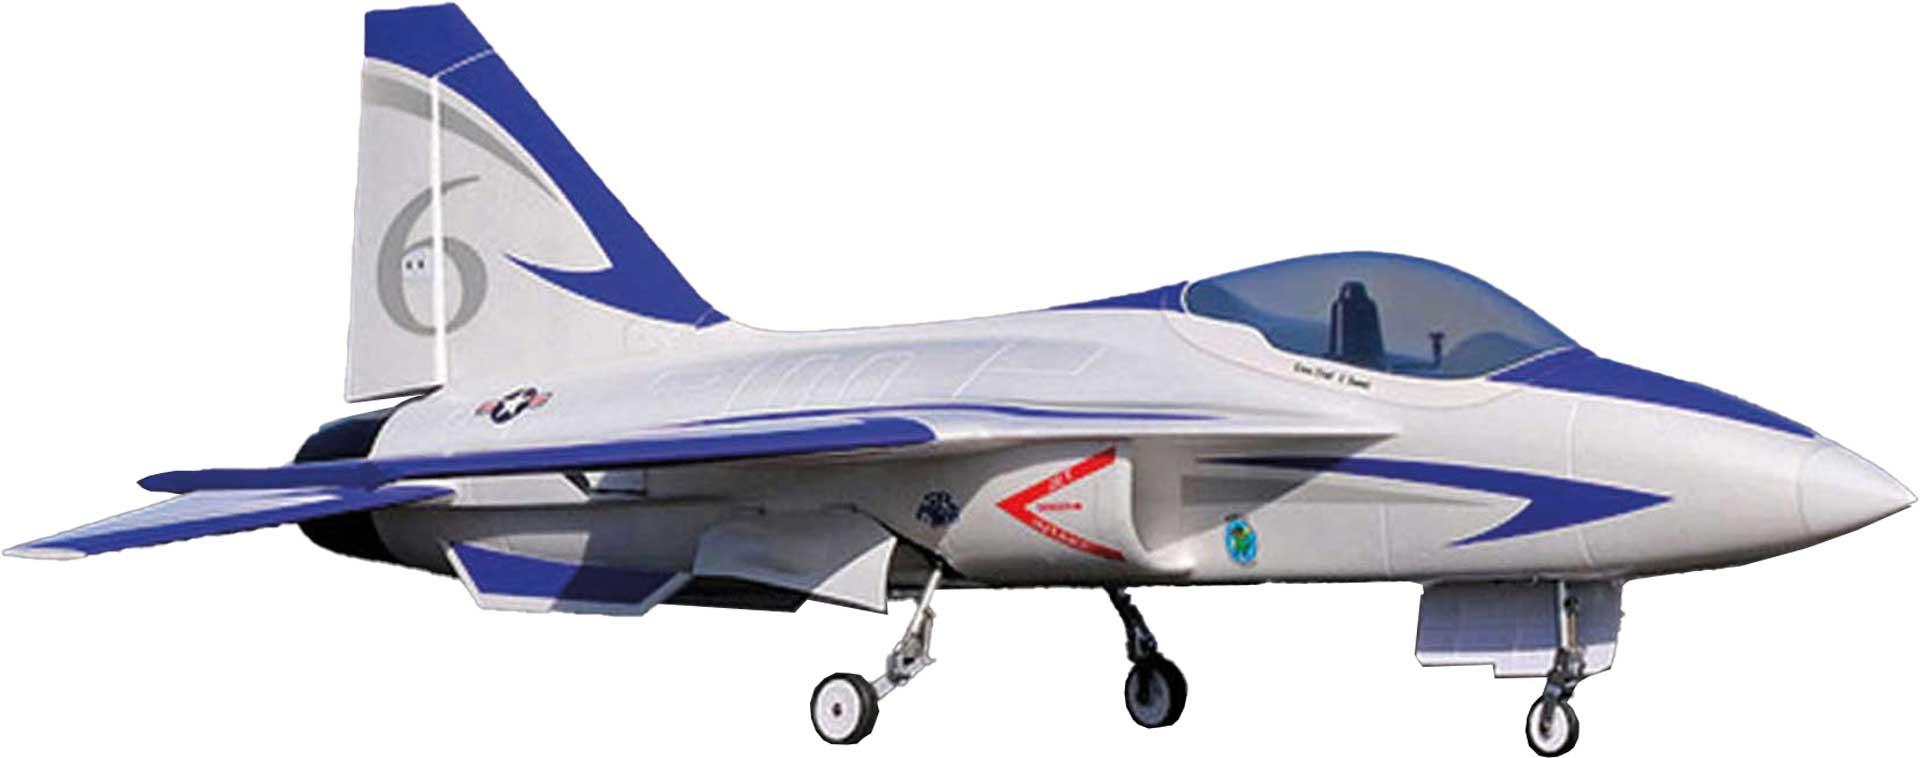 PREMIER AIRCRAFT FLEXJET 90MM EDF IMPELLER JET SUPER PNP BLAU MIT AURA 8 AFCS